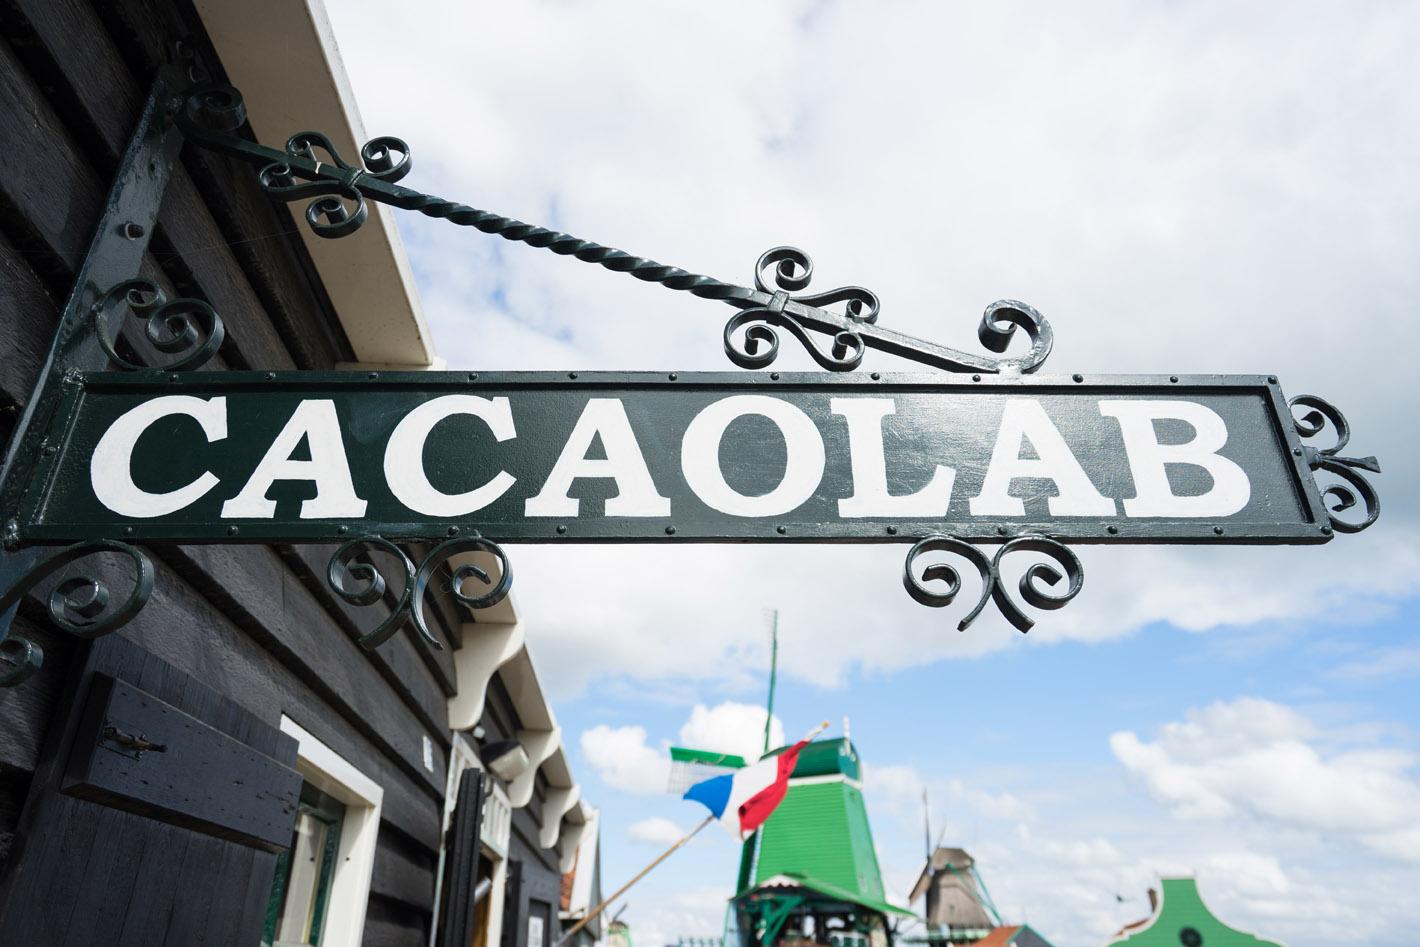 CacaoLab Zaanse Schans